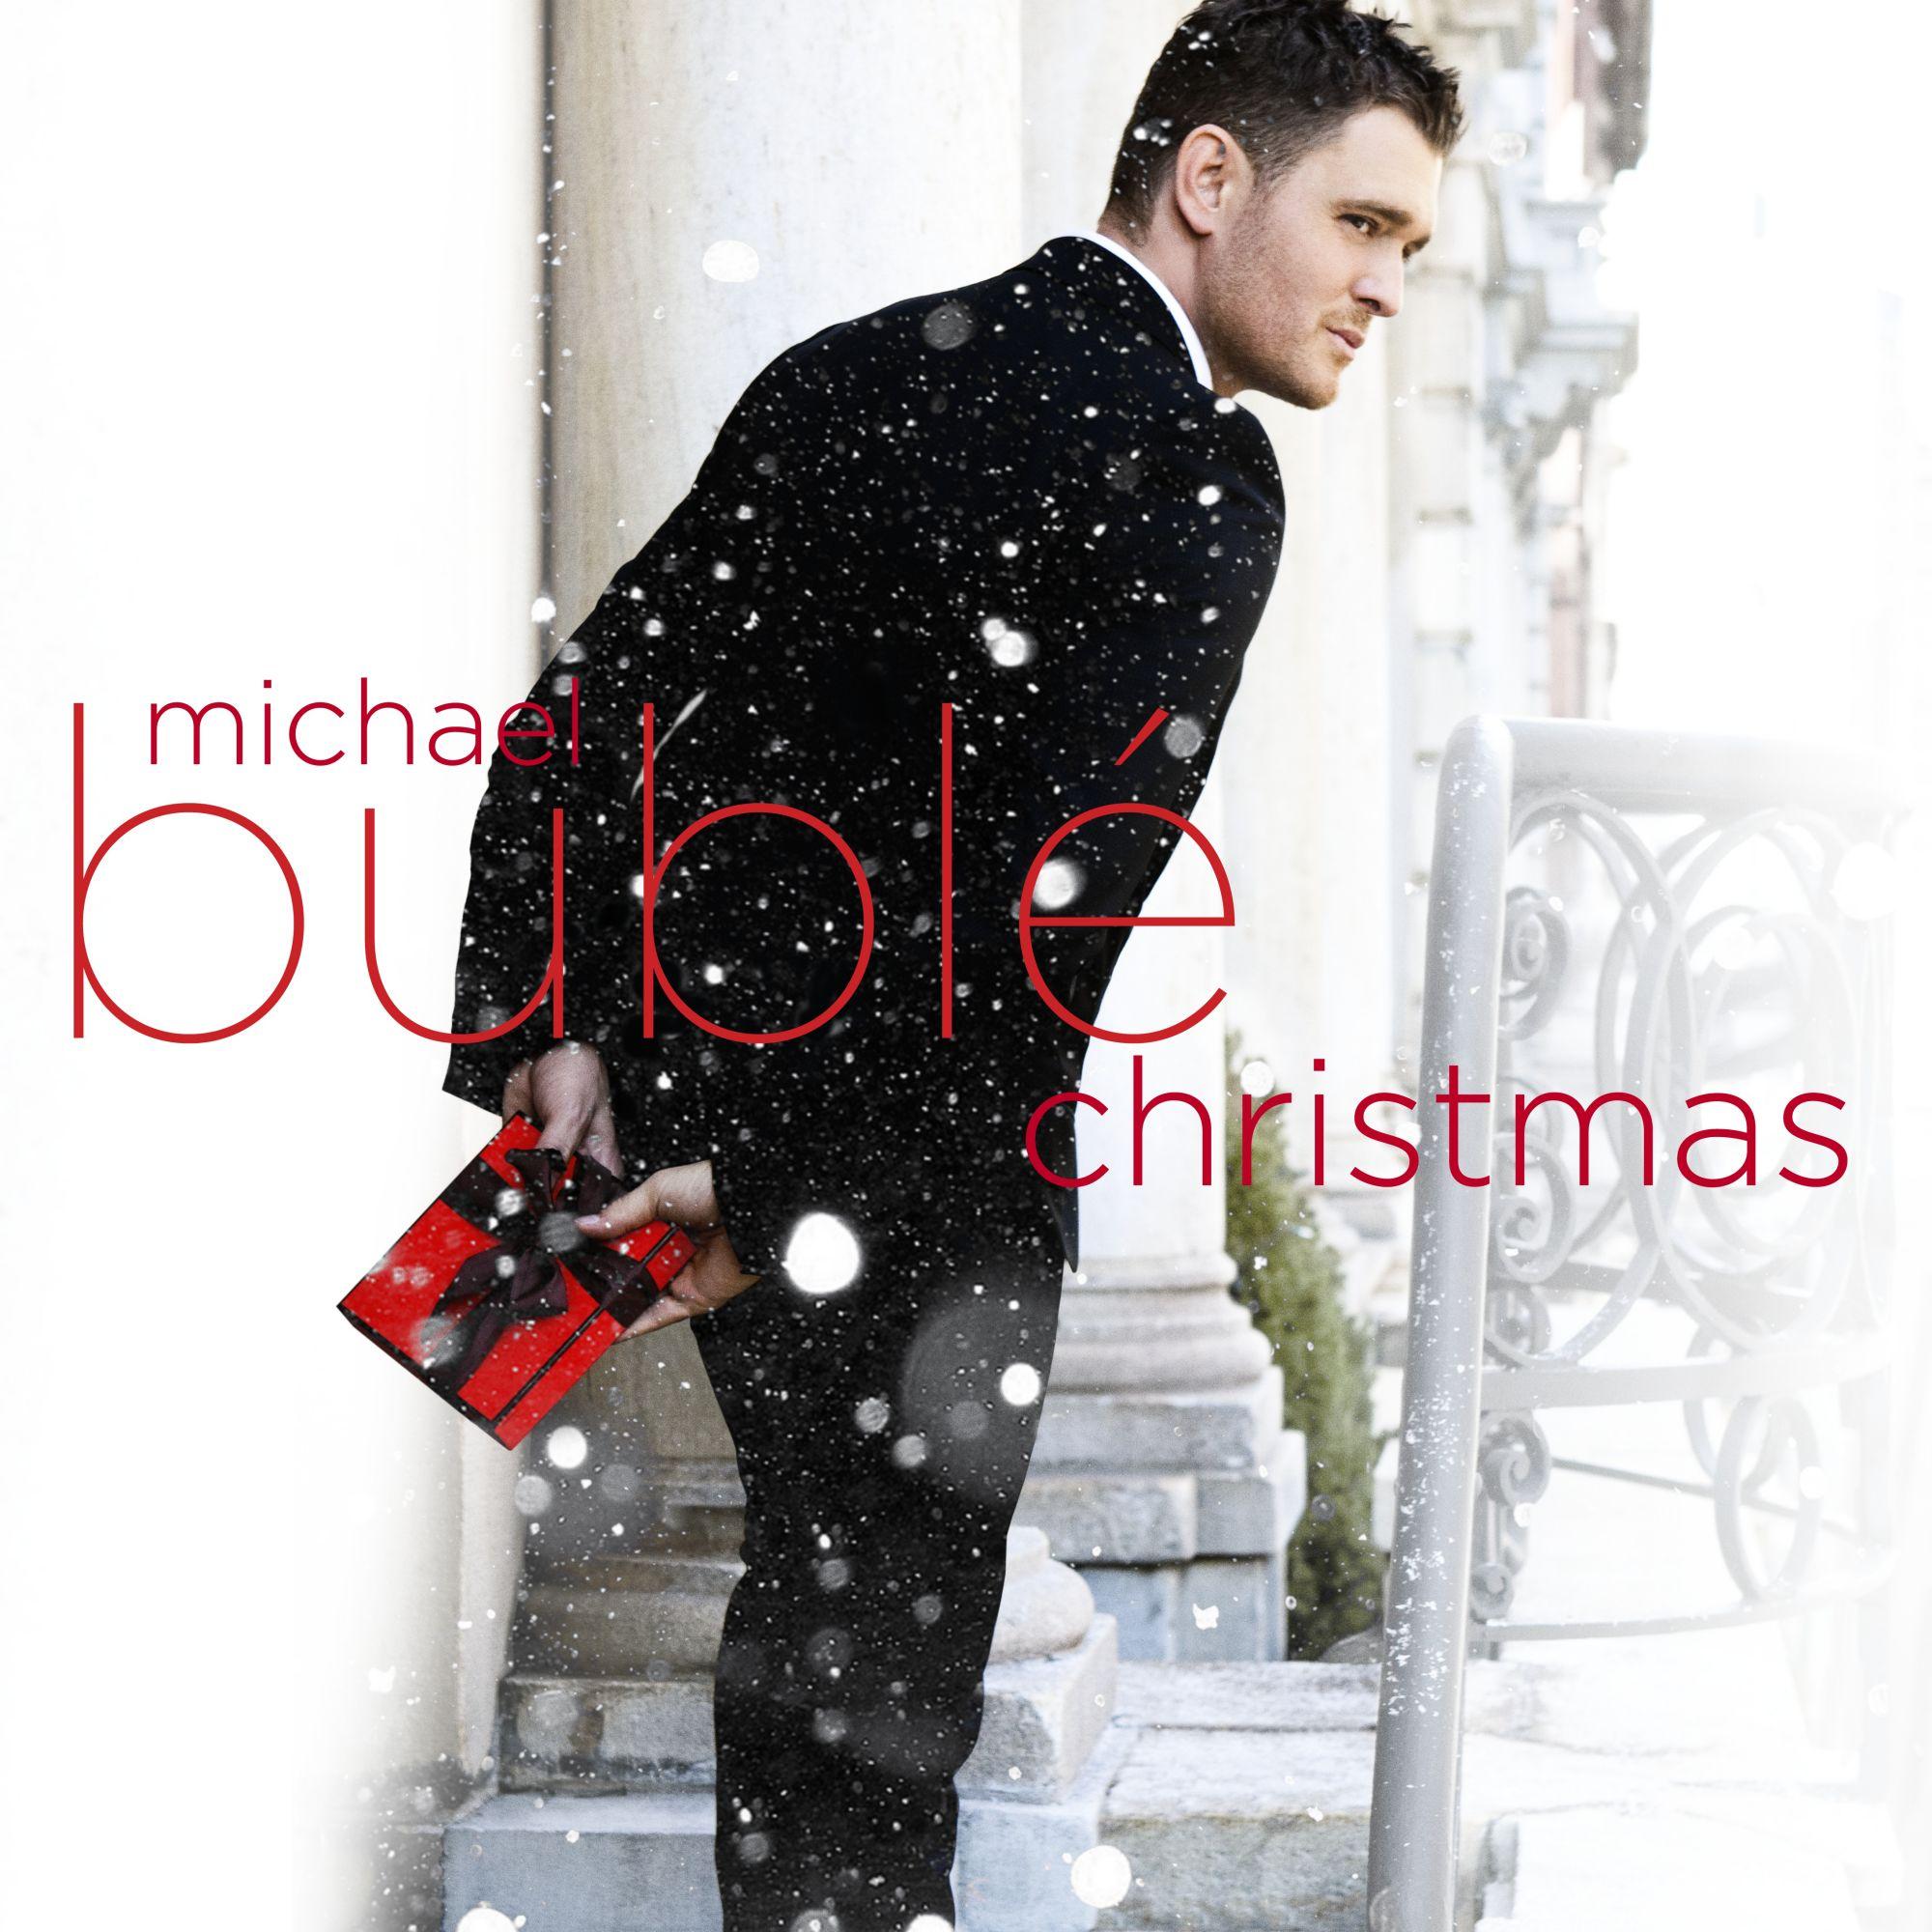 https://i0.wp.com/www.media.wmg-is.com/media/portal/media/cms/images/201108/christmas--cover-art-extralarge_1313541716823.jpg